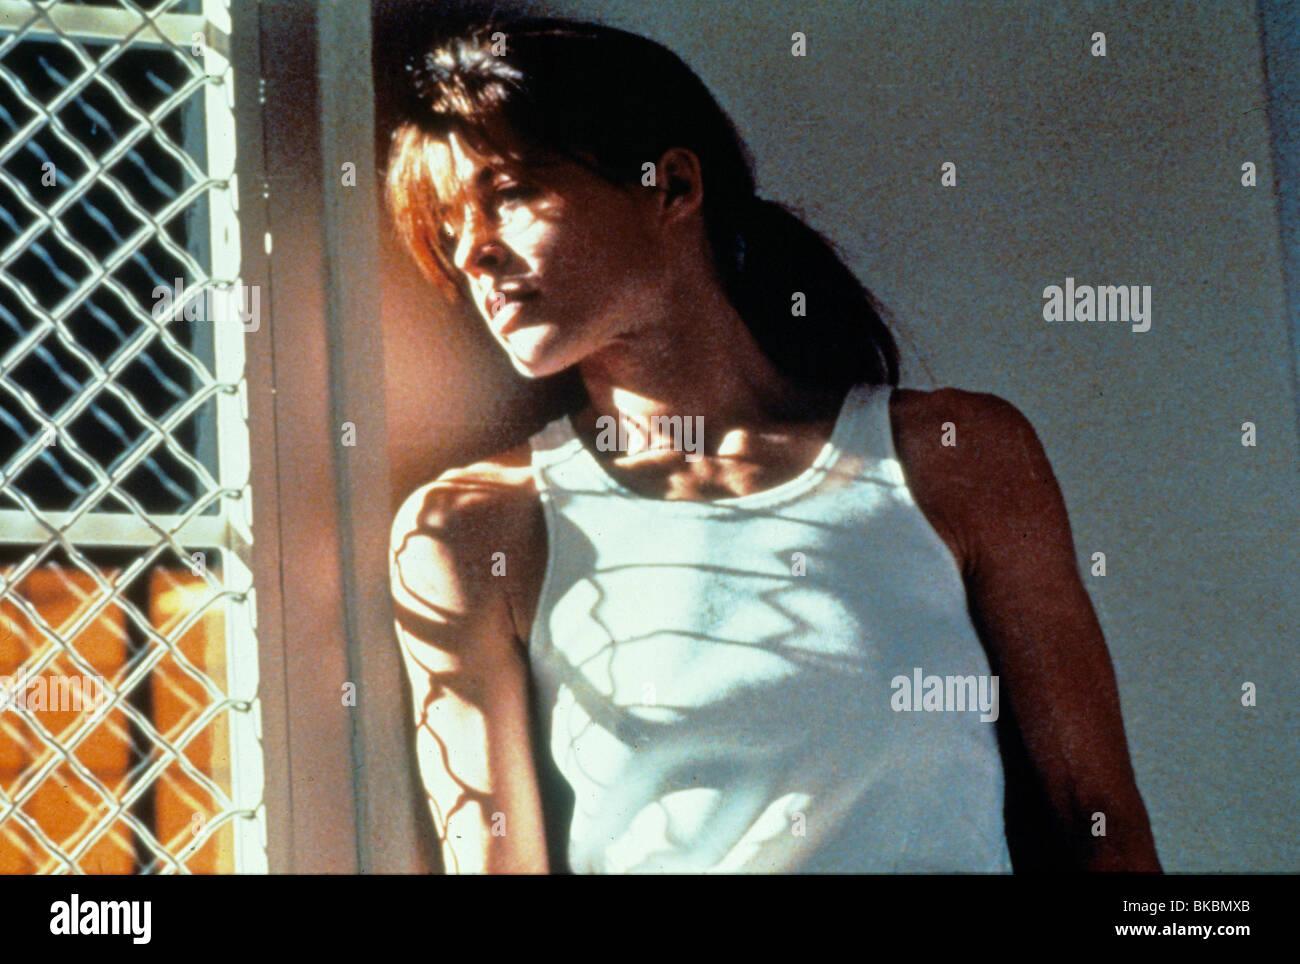 TERMINATOR 2: JUDGEMENT DAY (1991) LINDA HAMILTON TR2 150 - Stock Image